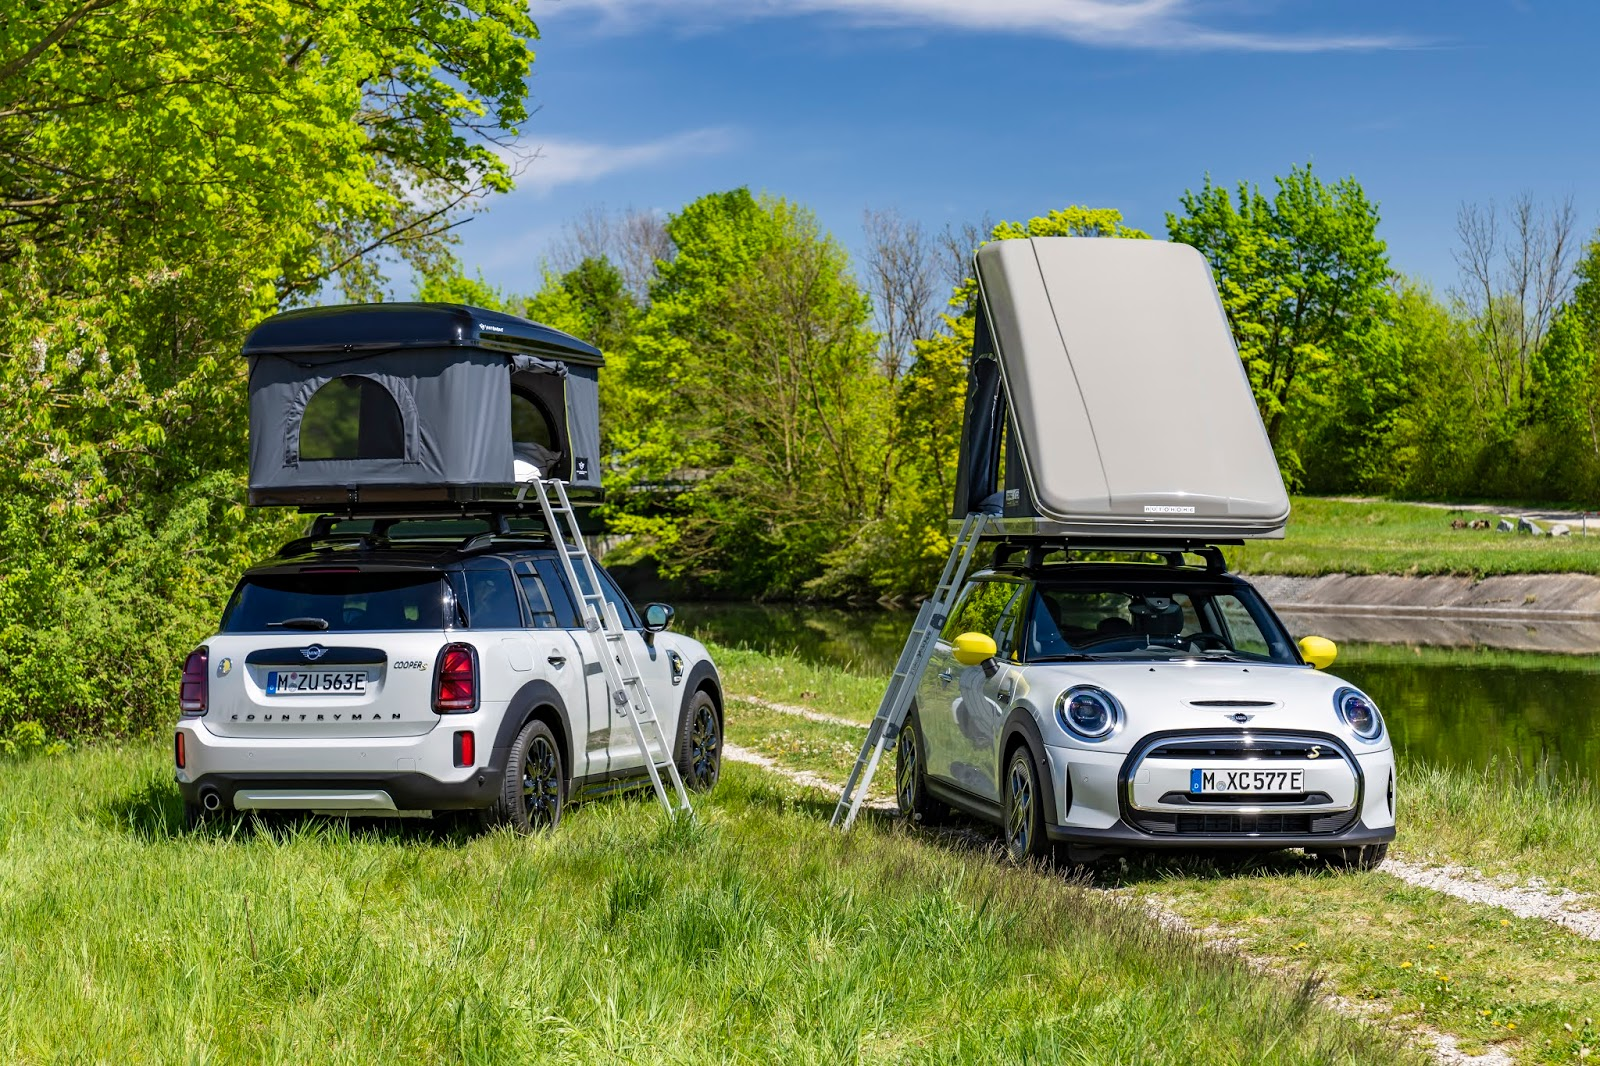 P90422193 highRes 1 Η MINI πηγαίνει διακοπές...με τον πιο πράσινο στόλο camper στον κόσμο